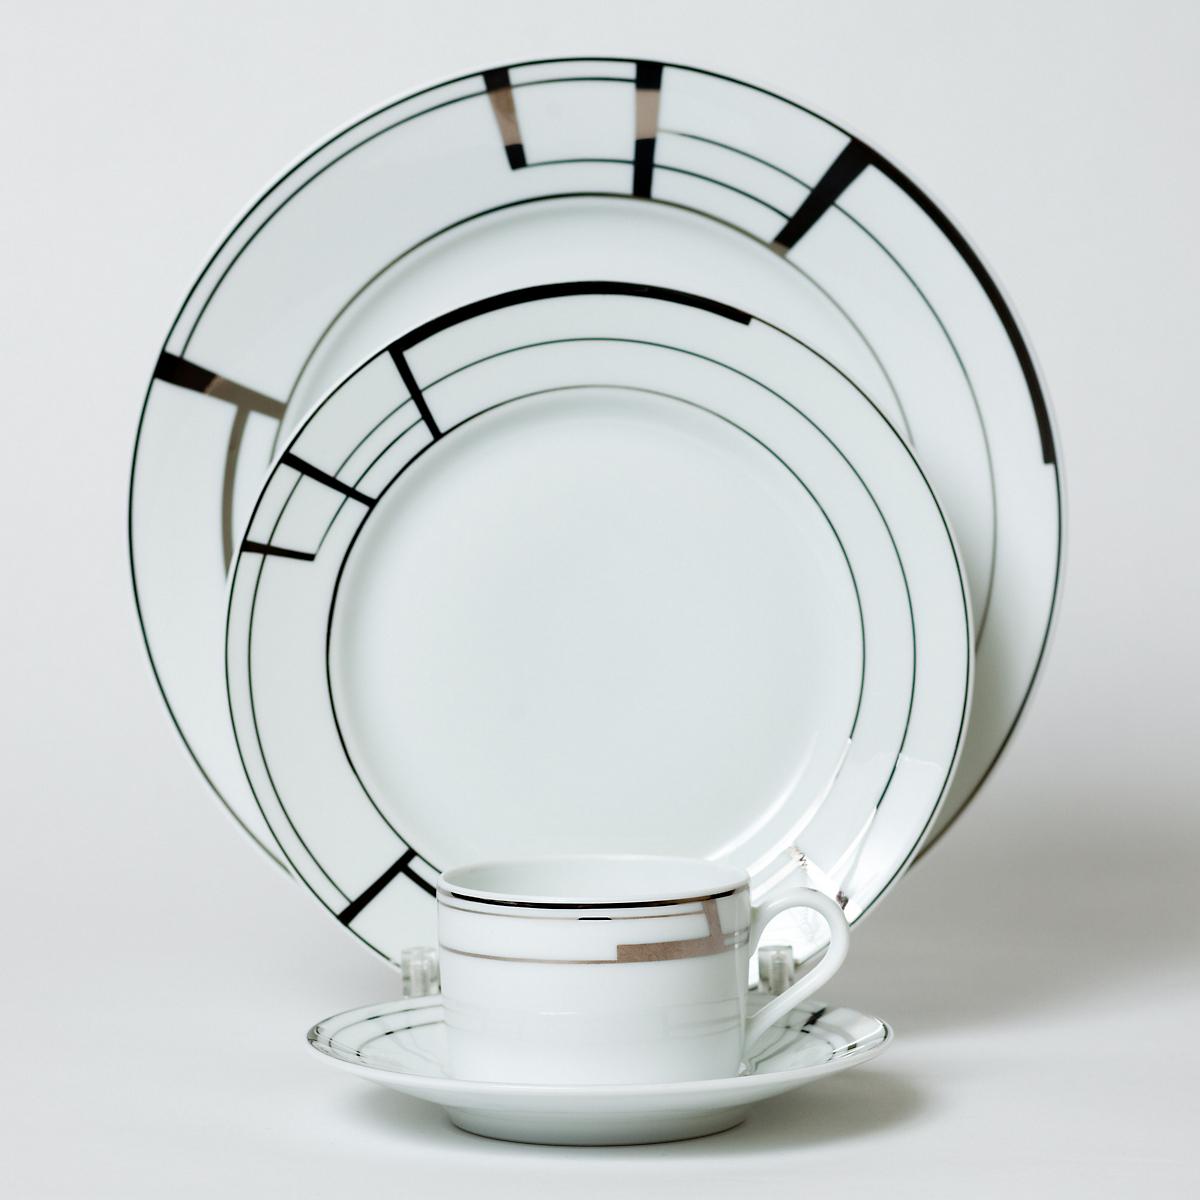 Puiforcat China Art Deco Dinnerware  sc 1 st  Gumpu0027s & Puiforcat China Art Deco Dinnerware | Gumpu0027s